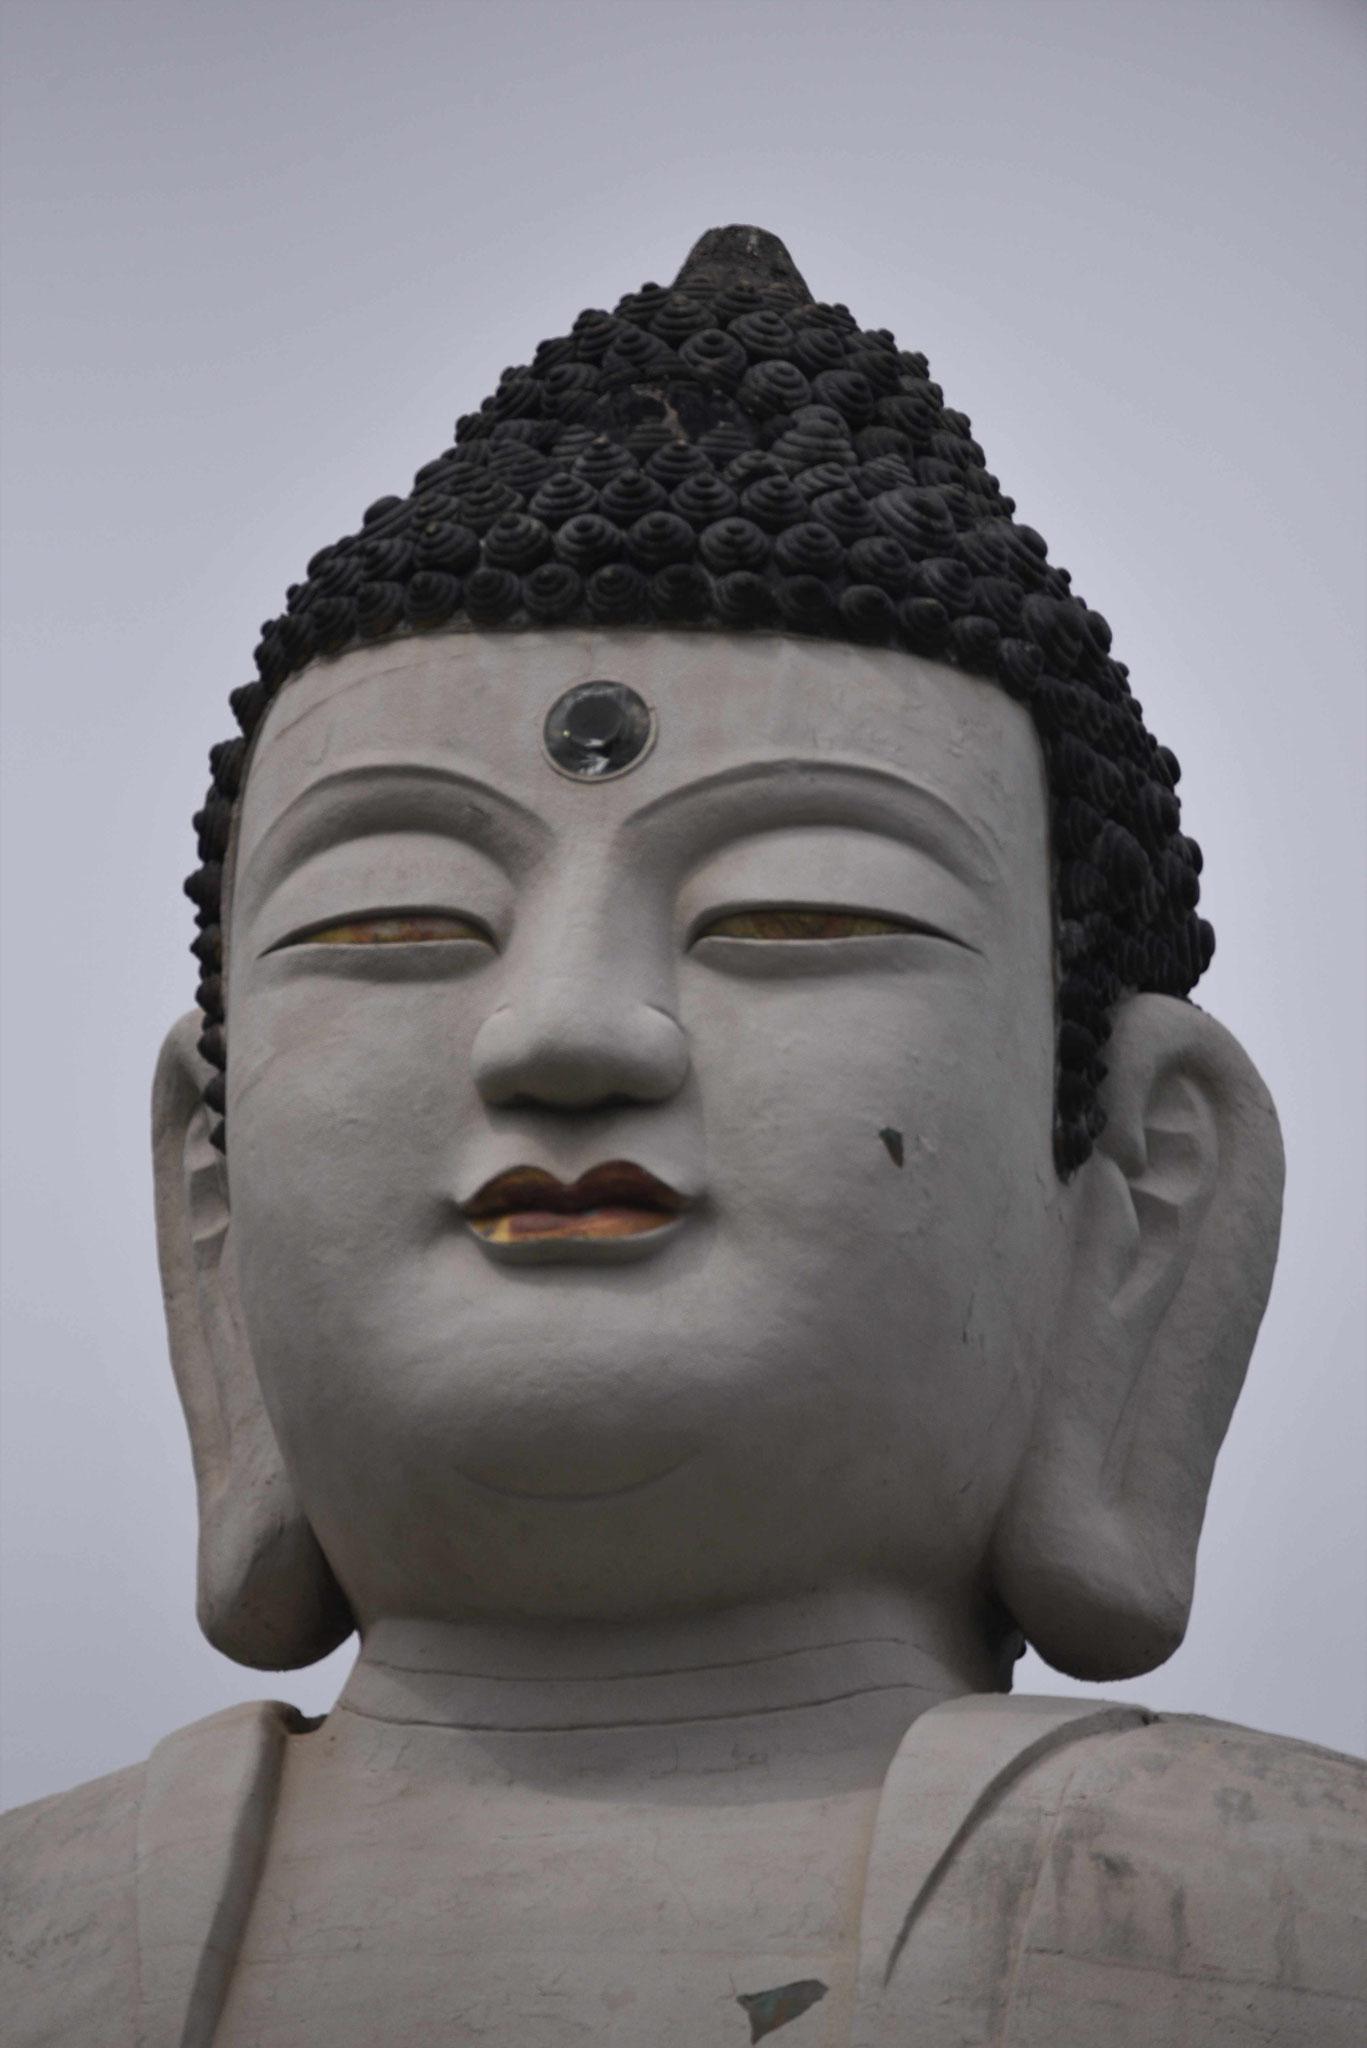 Kopf des Buddas